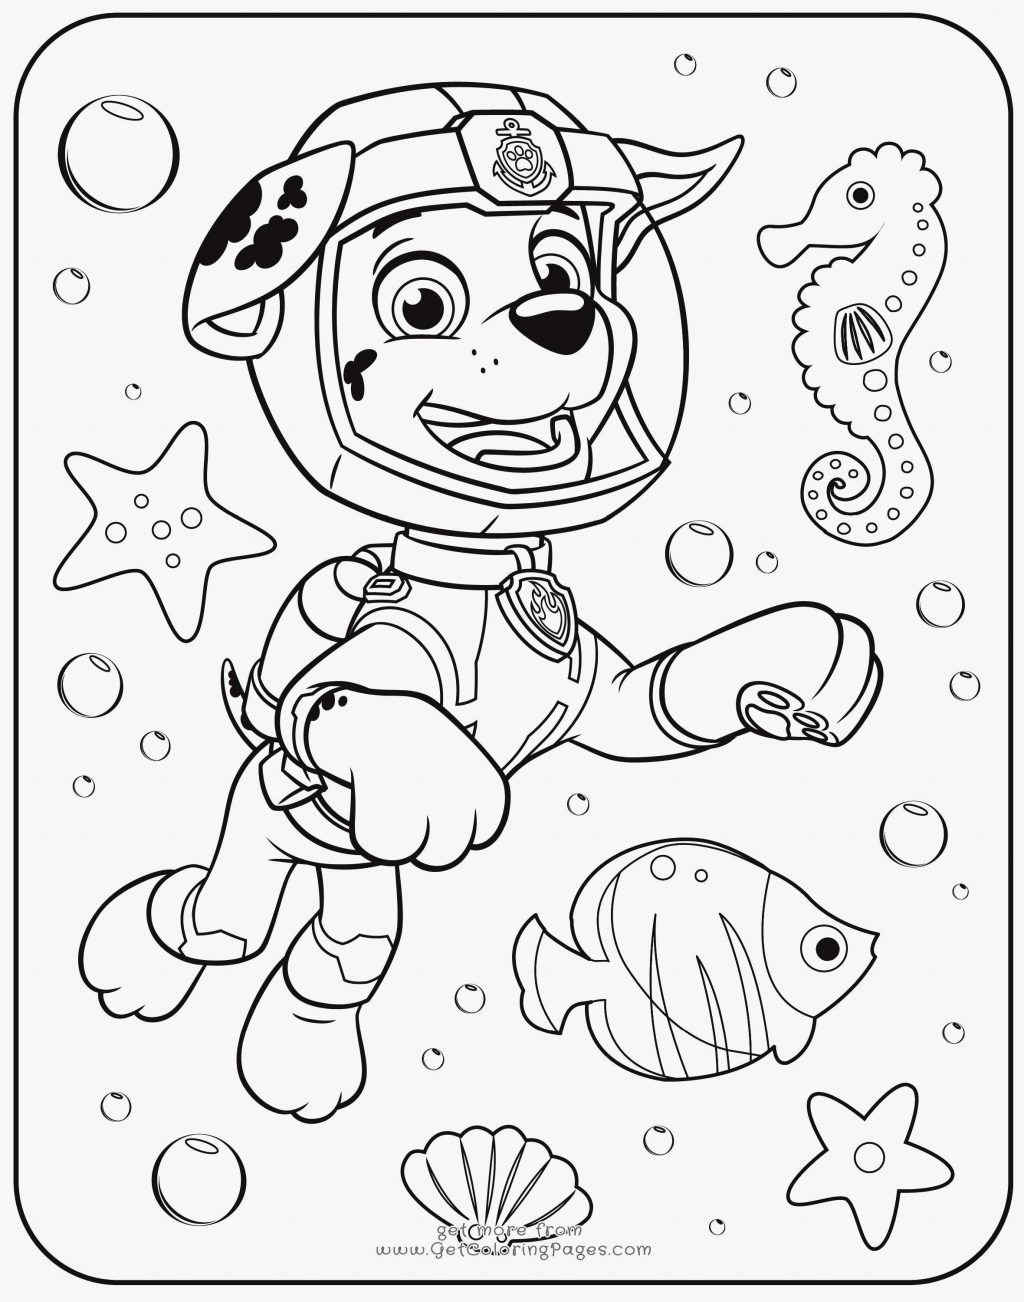 Grab Your Fresh Coloring Pages Paw Patrol Download Https Www Gethighit Com Fresh Coloring Pages Paw Patro Gratis Kleurplaten Kleurplaten Disney Kleurplaten